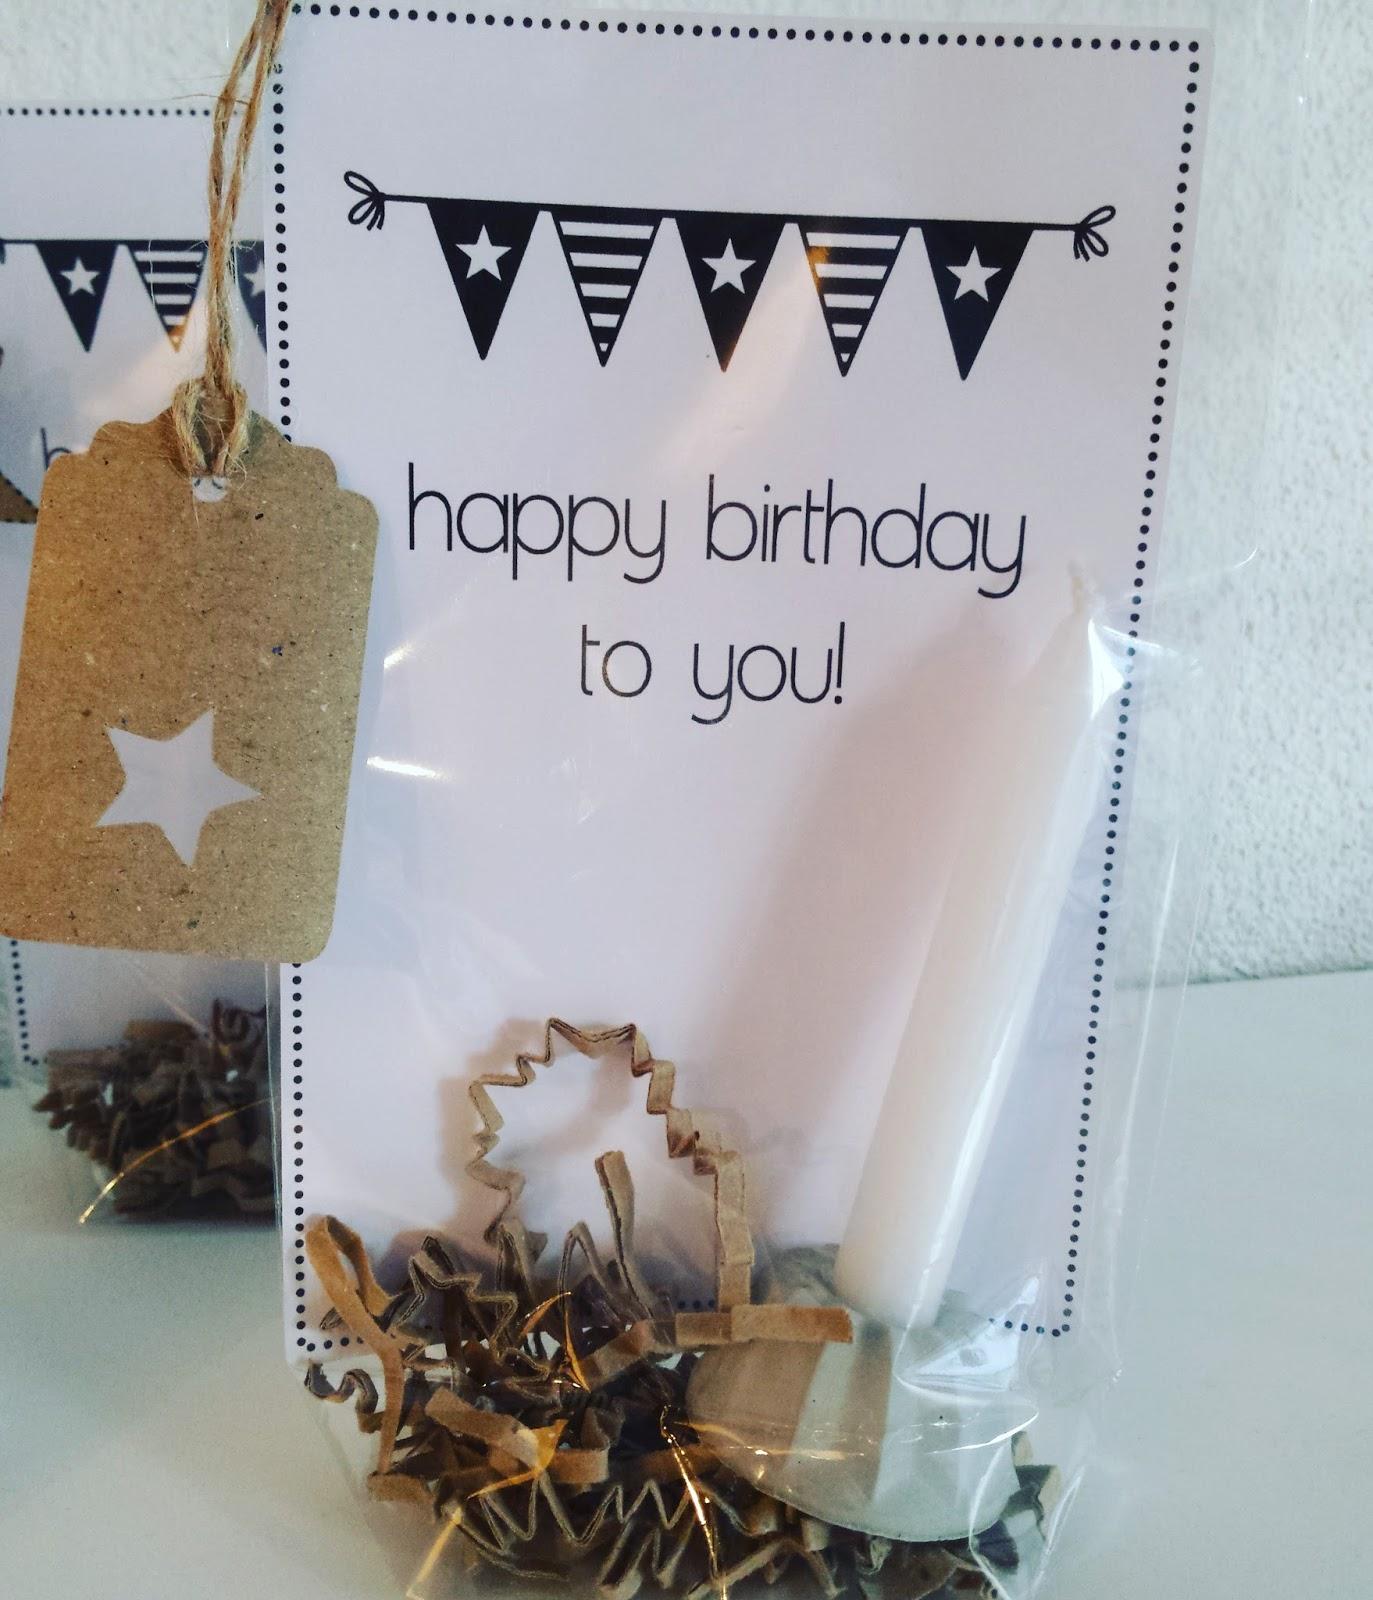 Happy Birthday Karte Für Frauen.Frau Root Glückwunschkarte Happy Birthday